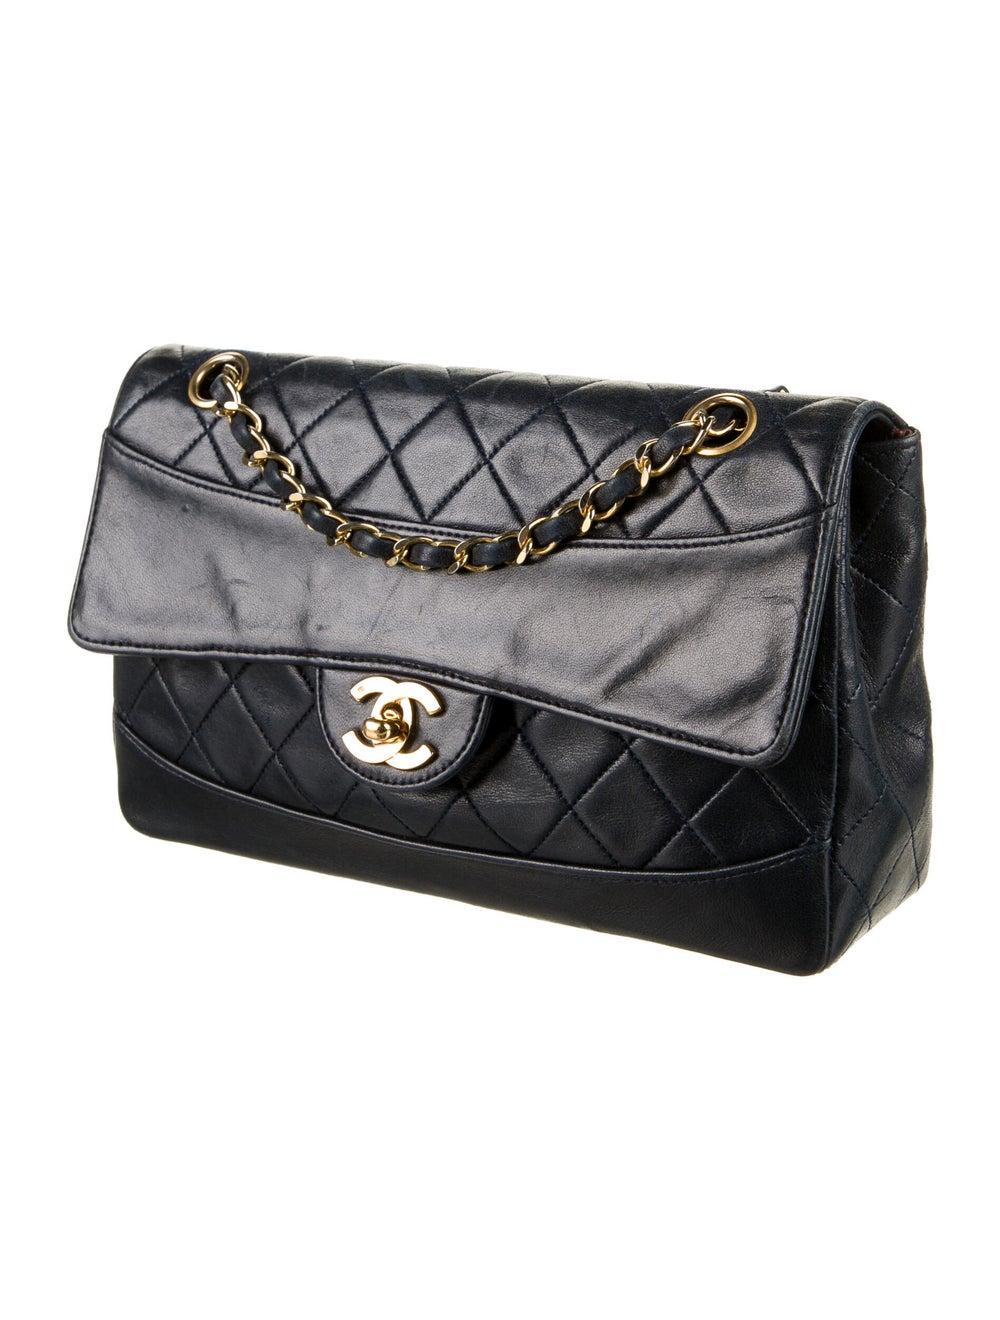 Chanel Vintage Quilted Flap Bag Blue - image 3